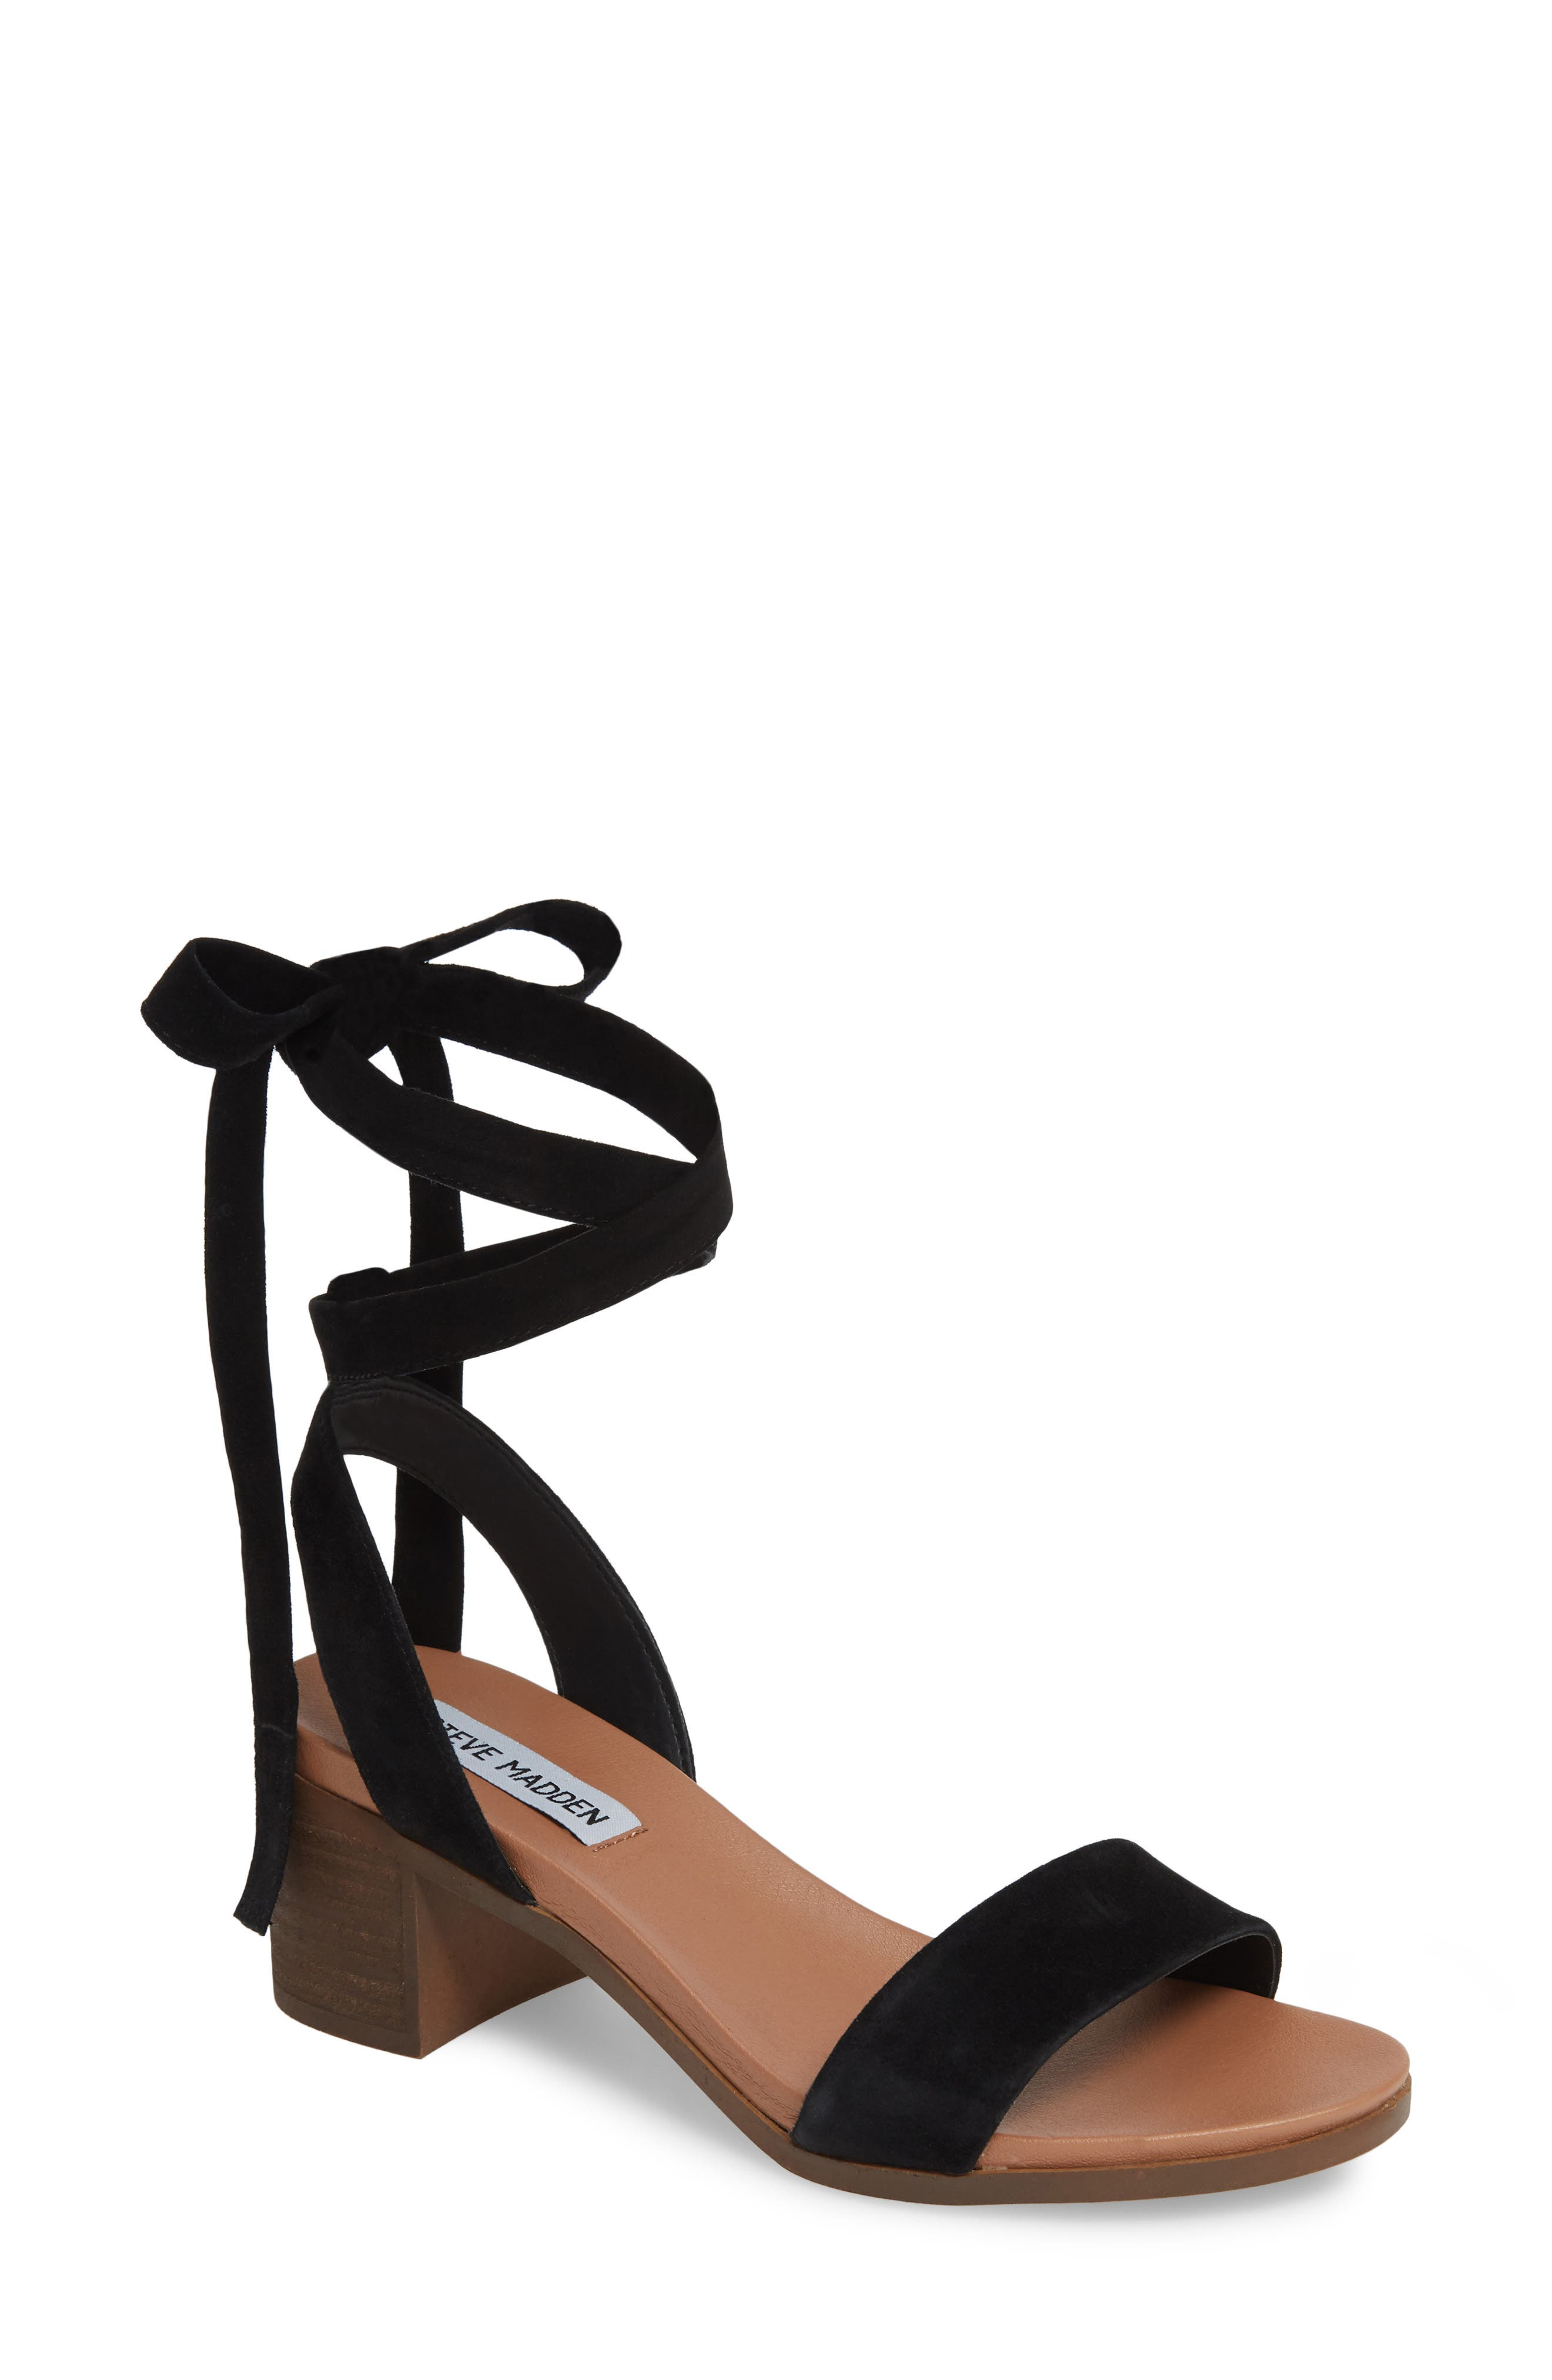 Adrianne Ankle Wrap Sandal, Main, color, BLACK SUEDE